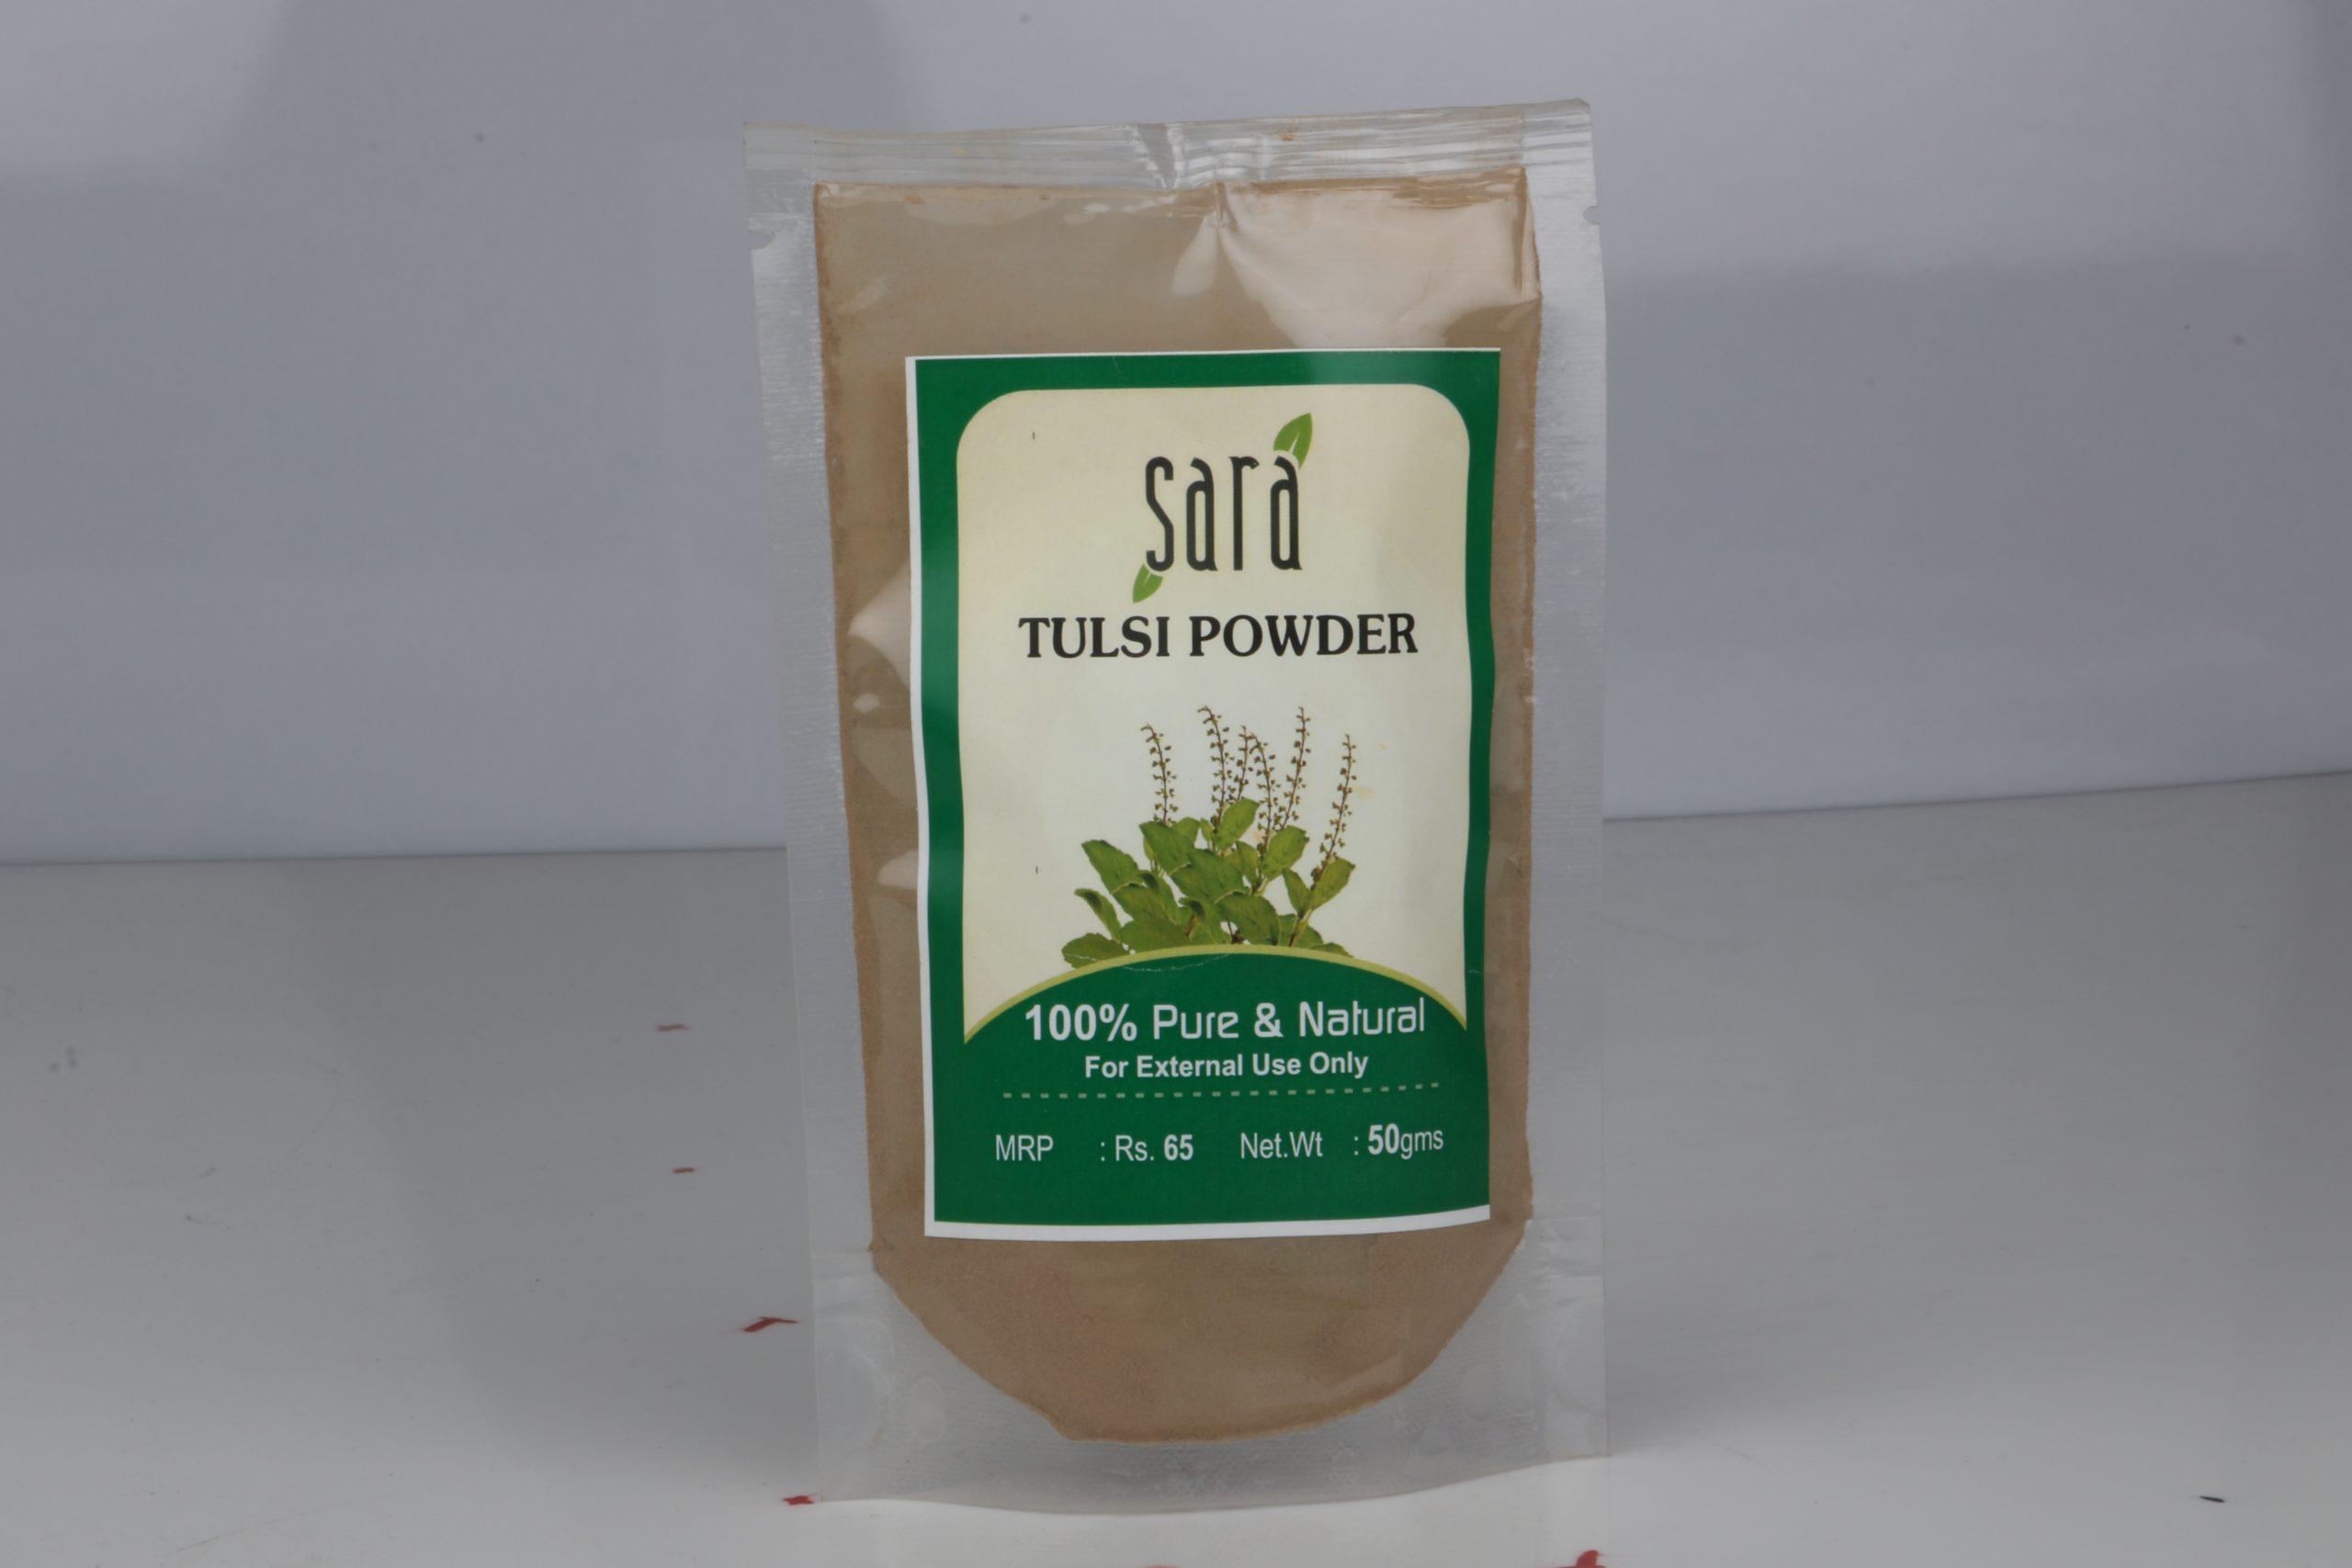 SARA TULSI POWDER 50GM